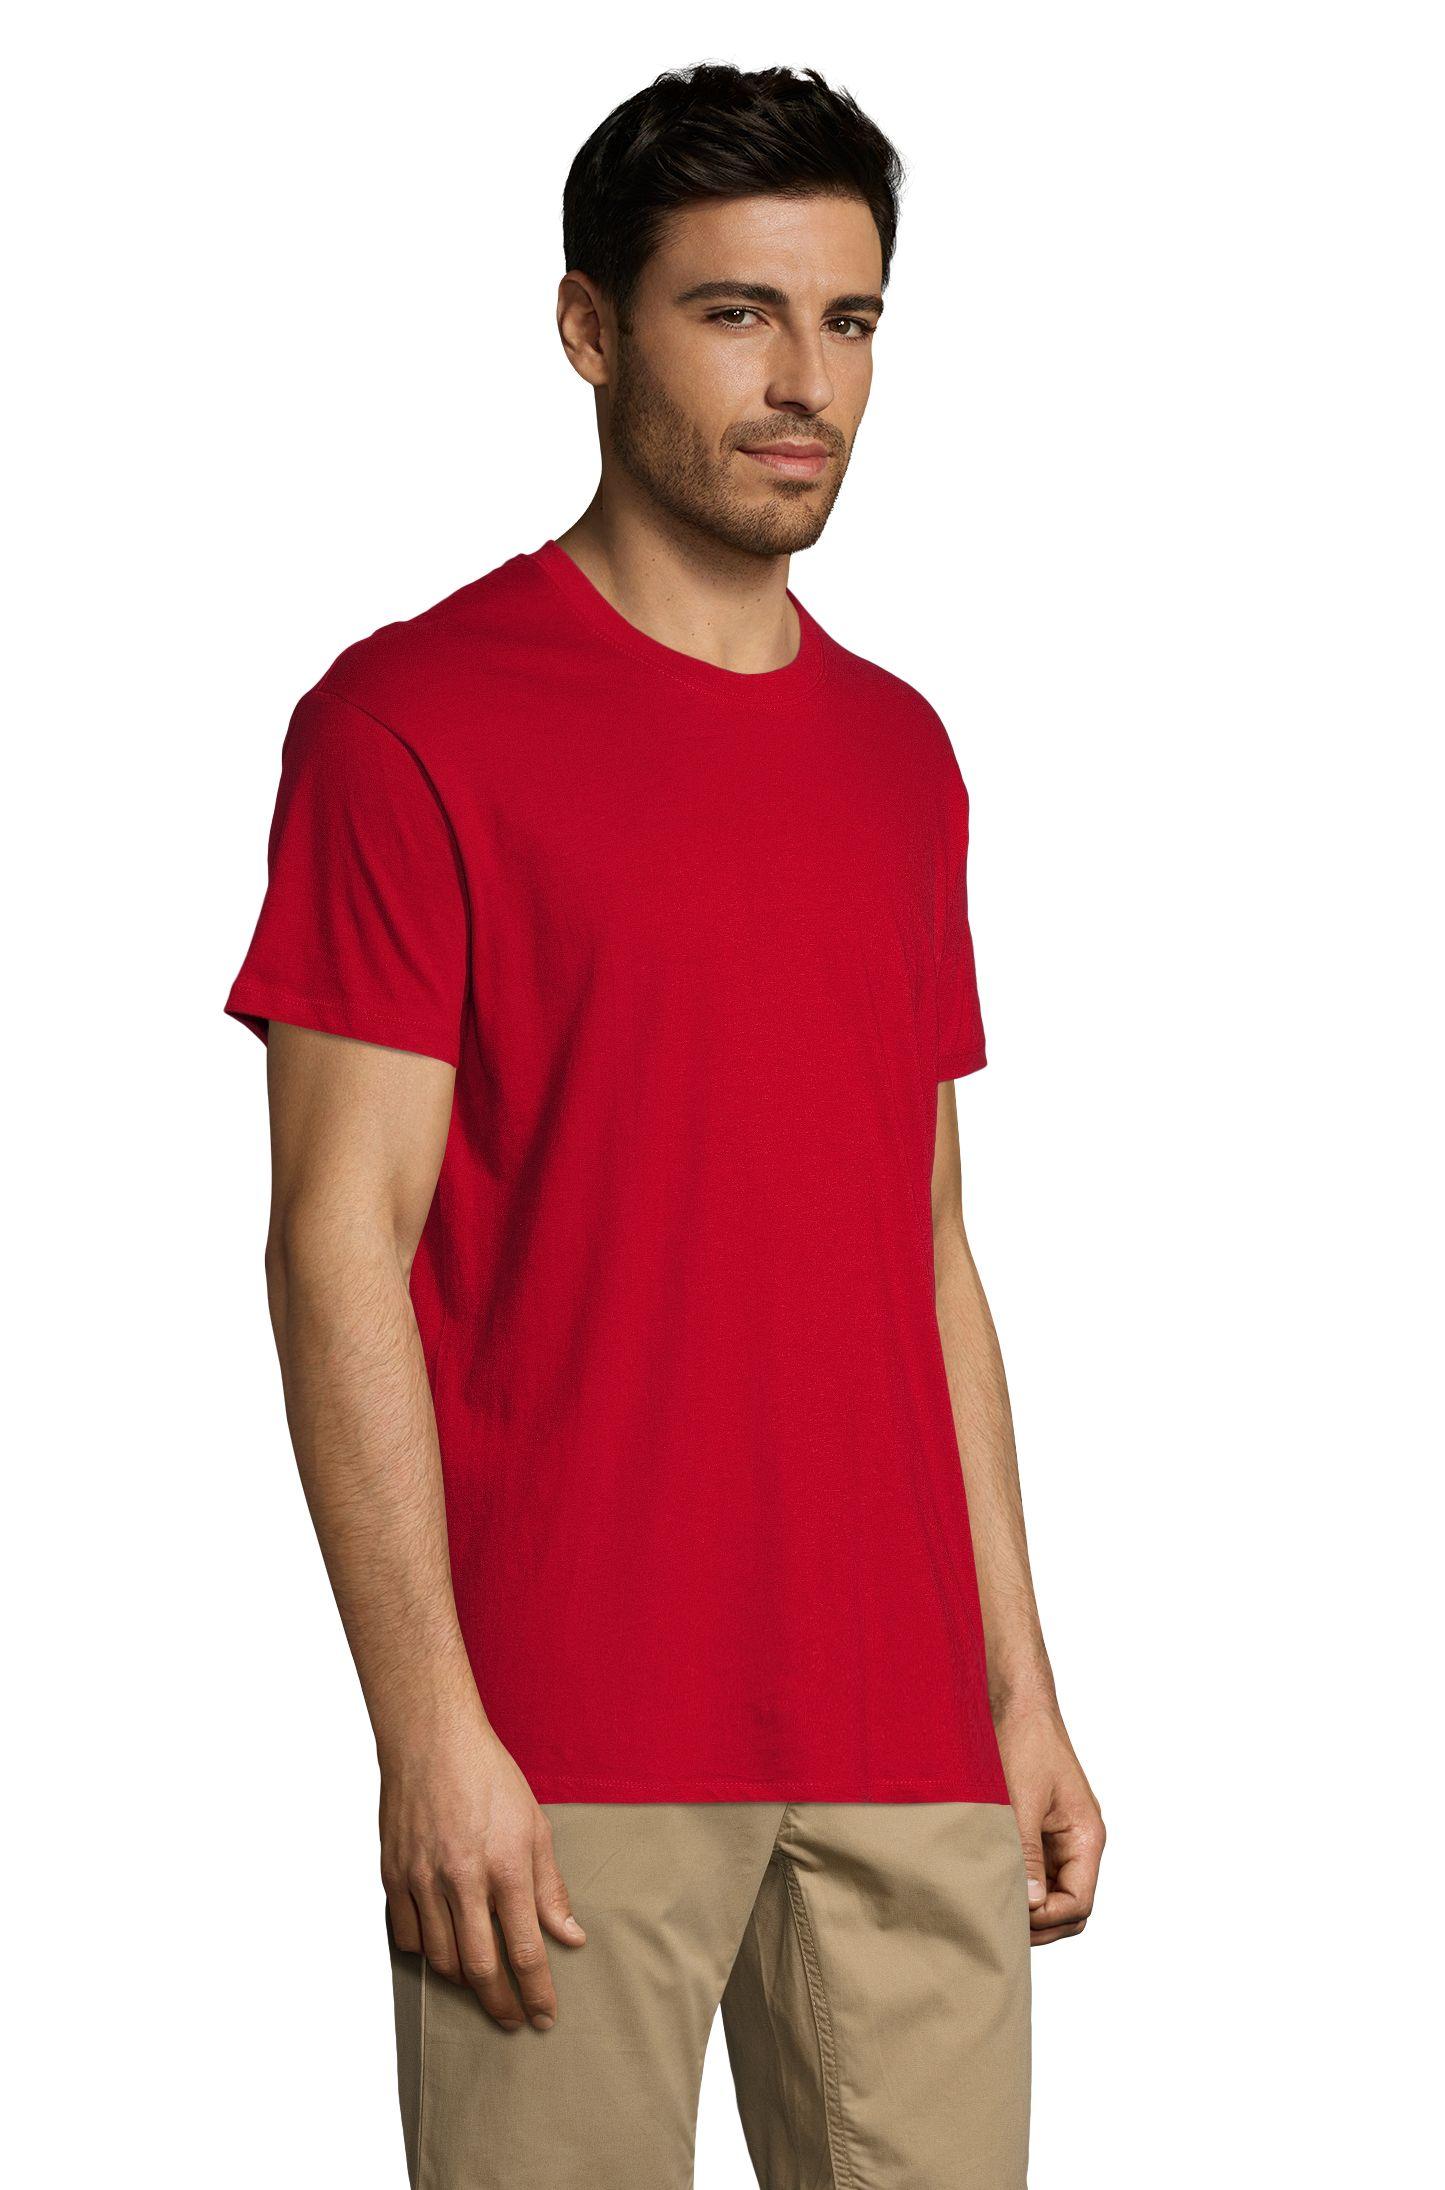 154 - Tango red